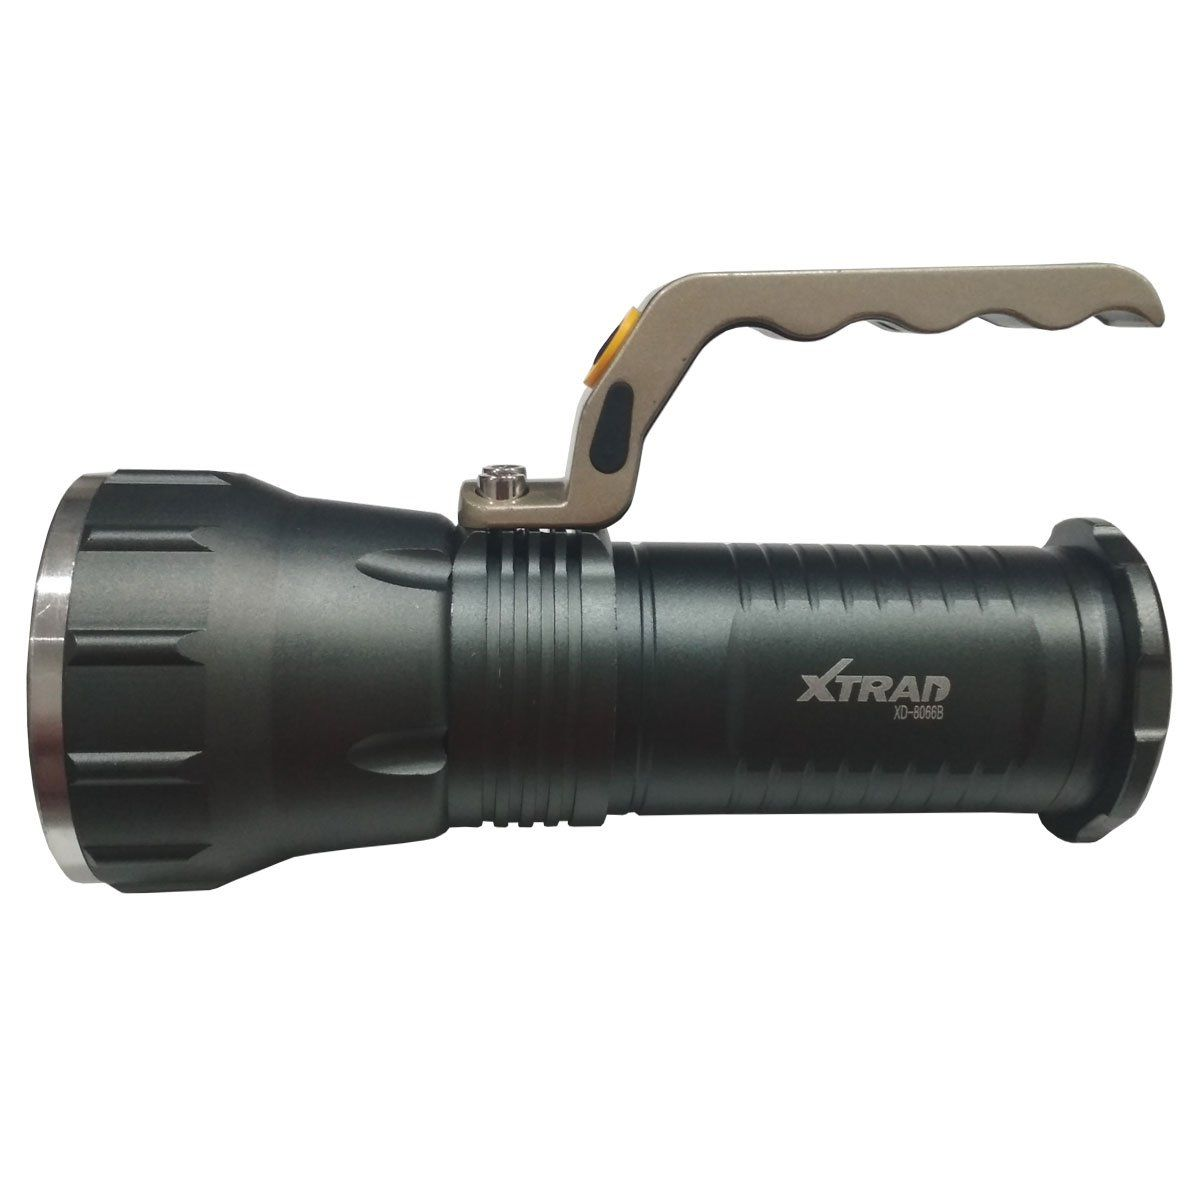 Lanterna Xtrad Max 8000 Lumens